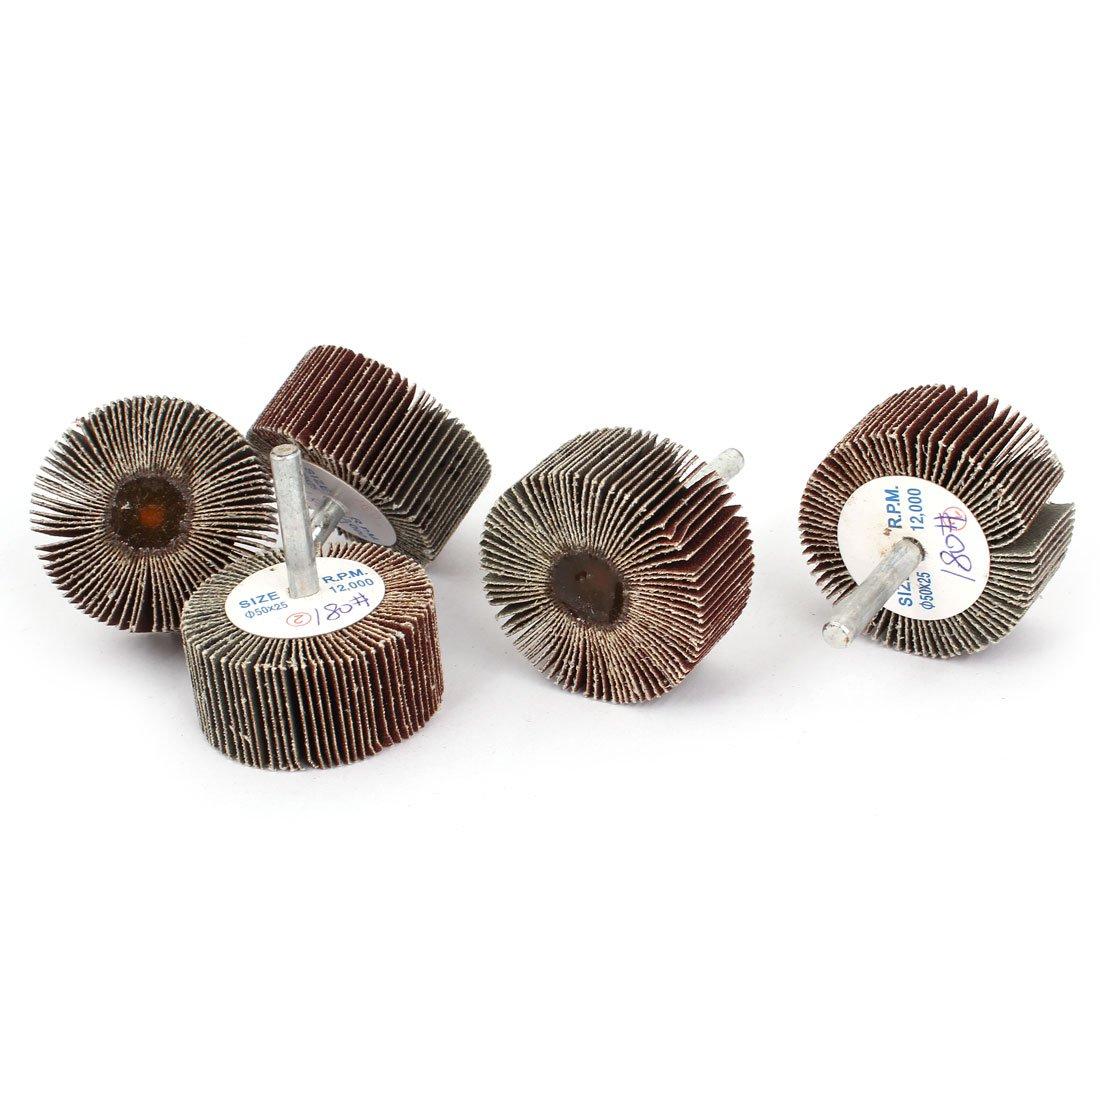 sourcingmap® 50mm x 25mm x 6mm 180 Grit Emery Cloth Grinding Flap Wheel Discs 5pcs a14112100ux0420